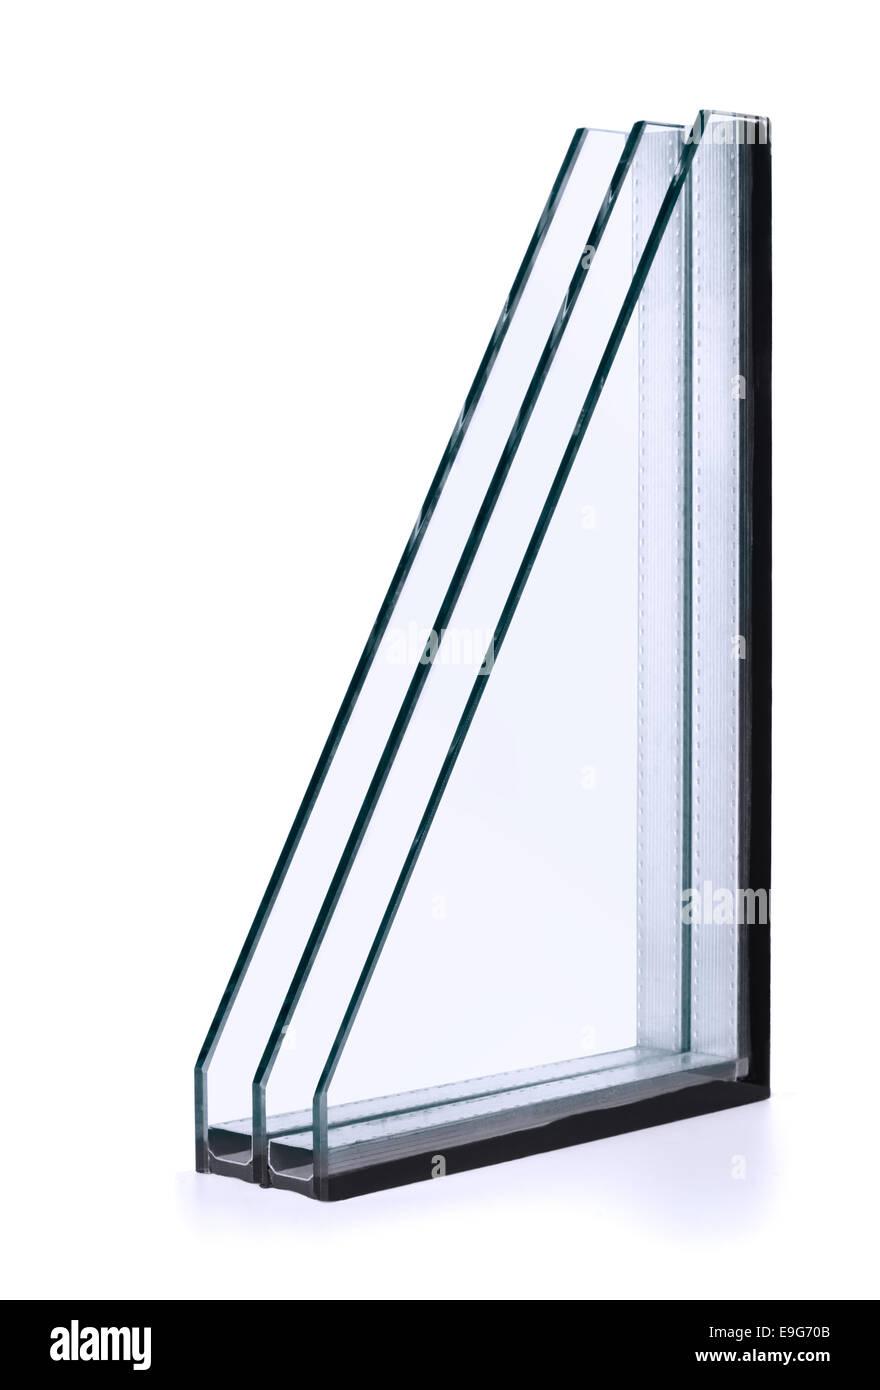 Isolierverglasung Stockbild